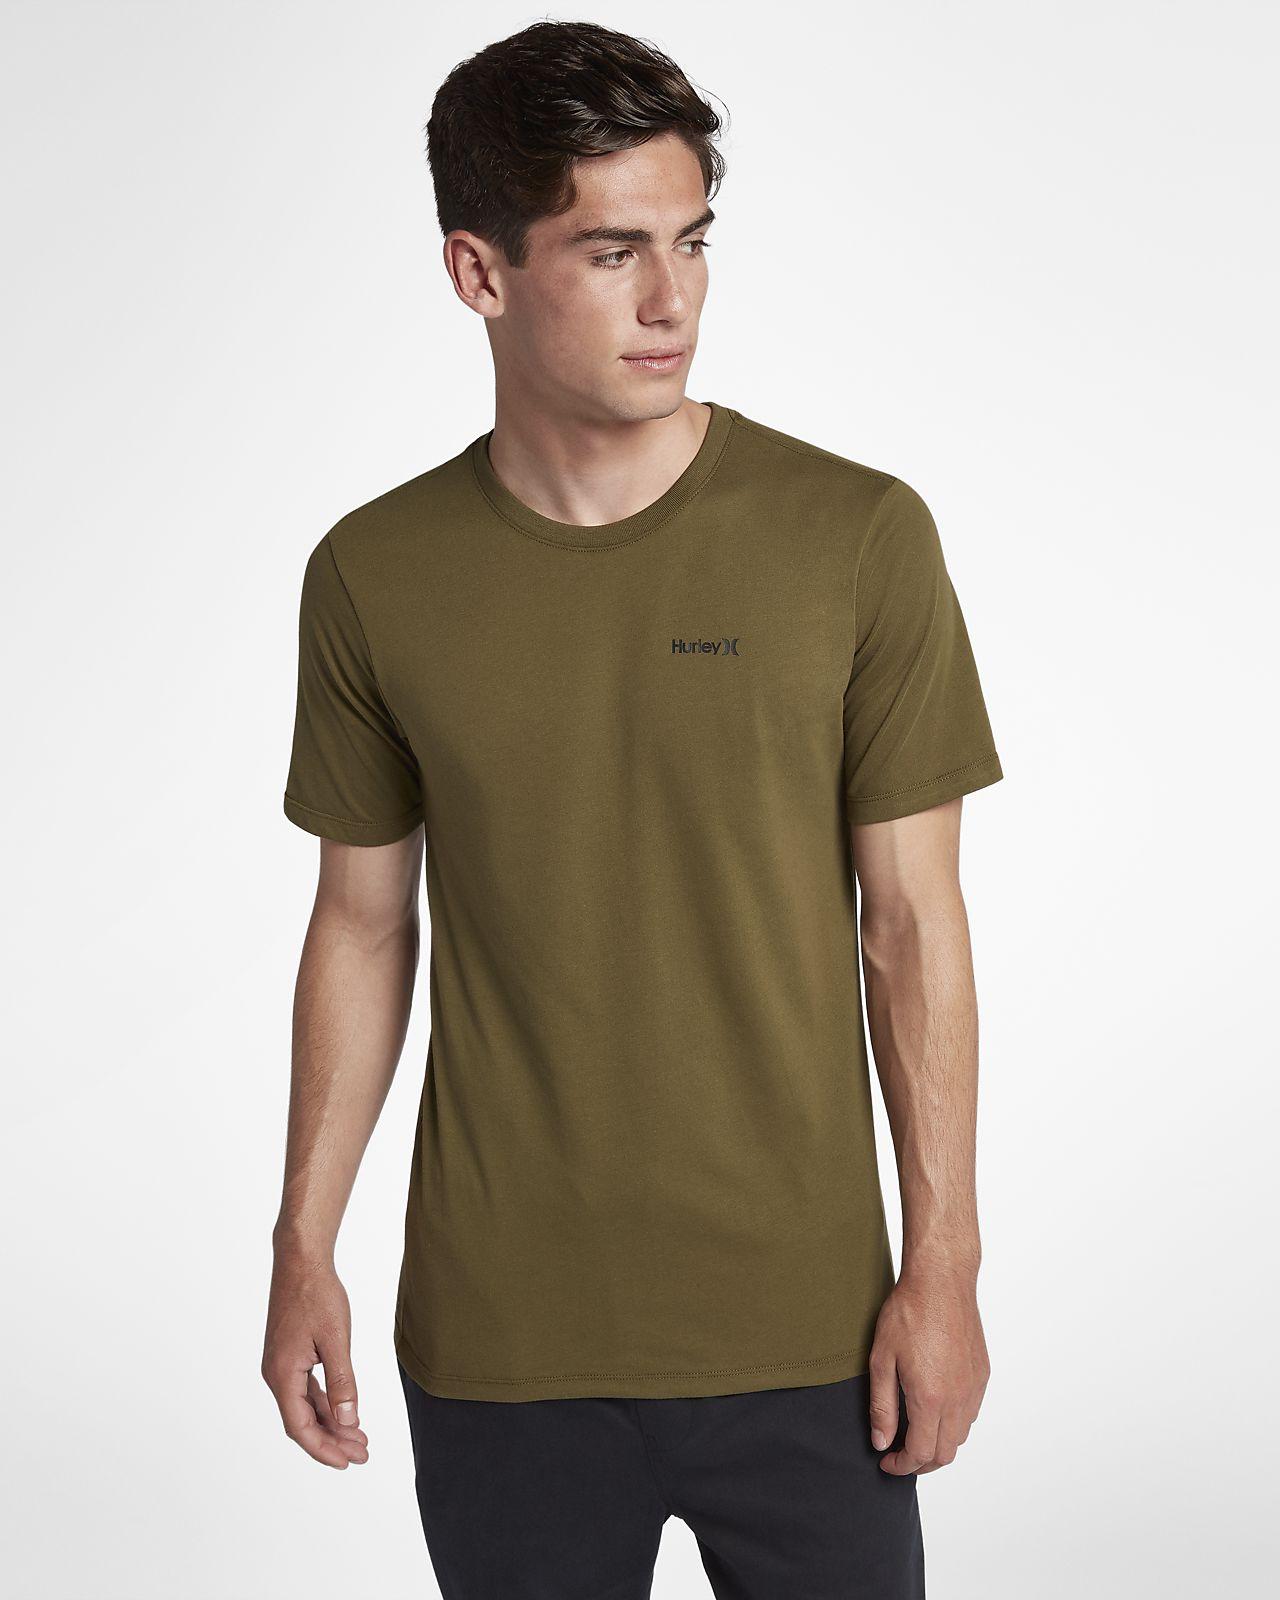 classic fit 107ed f496c ... T-shirt Hurley Dri-FIT One And Only för män